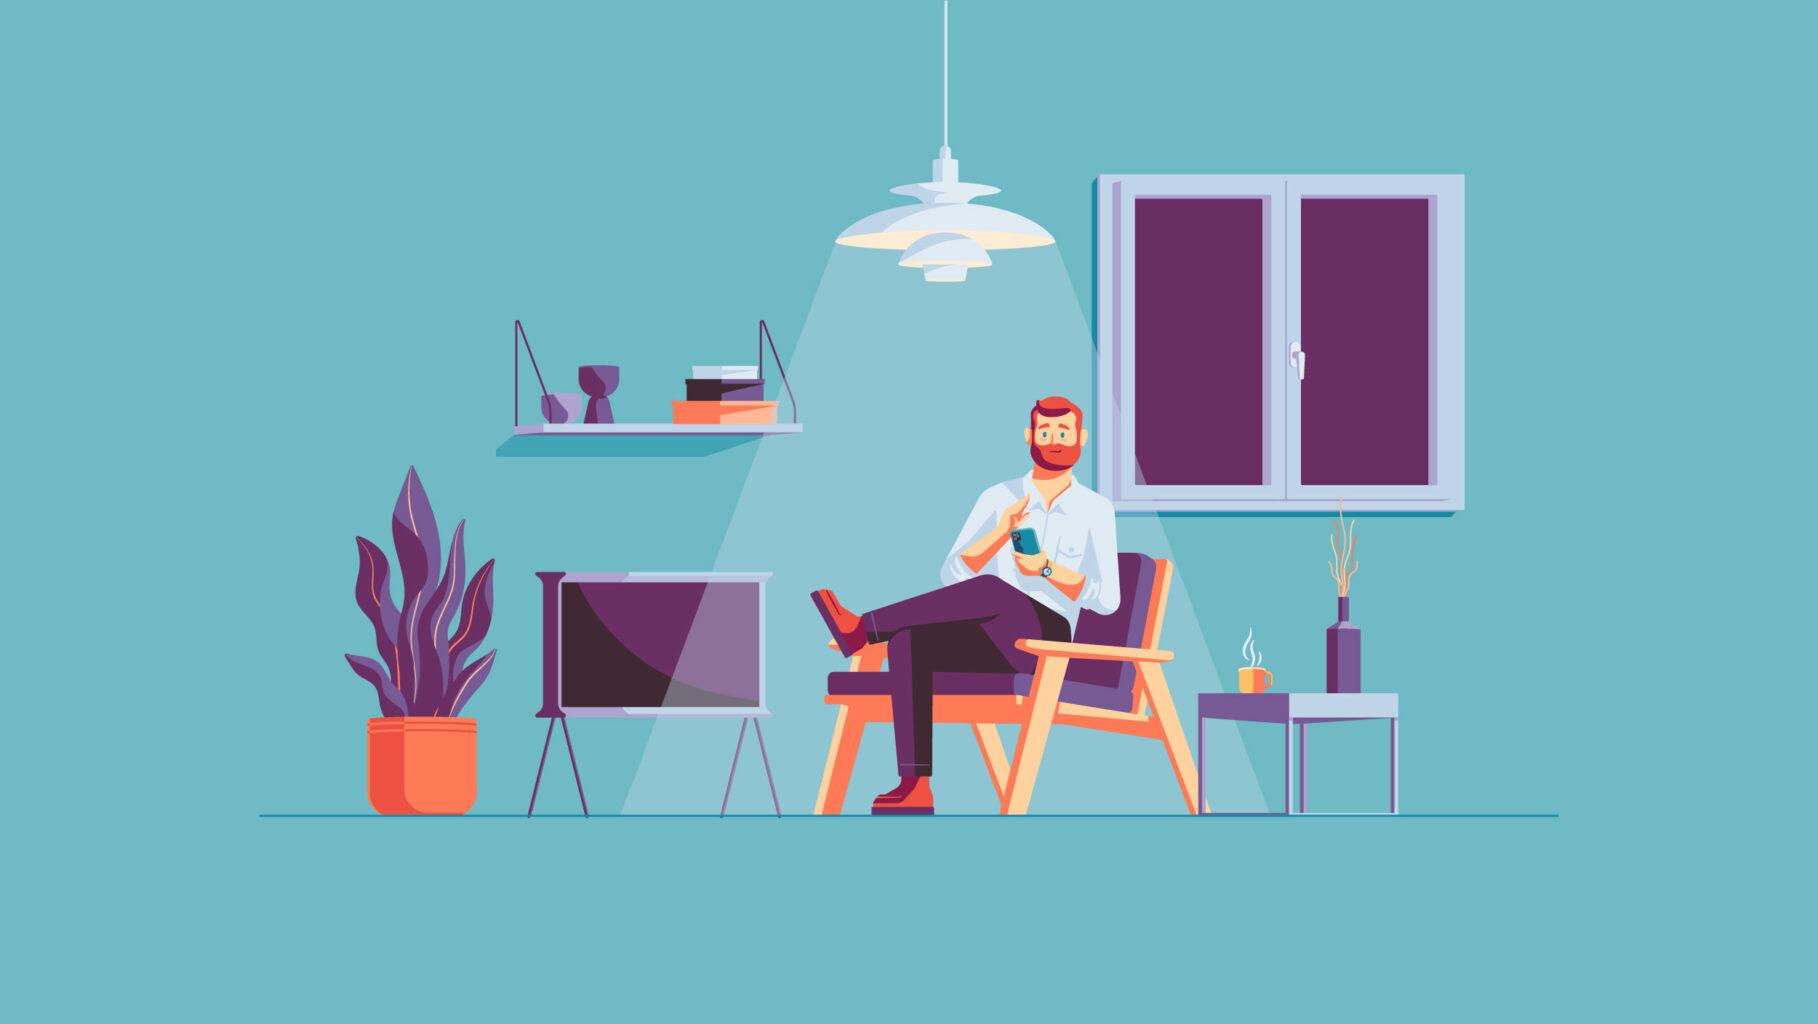 Illustration system living room scene